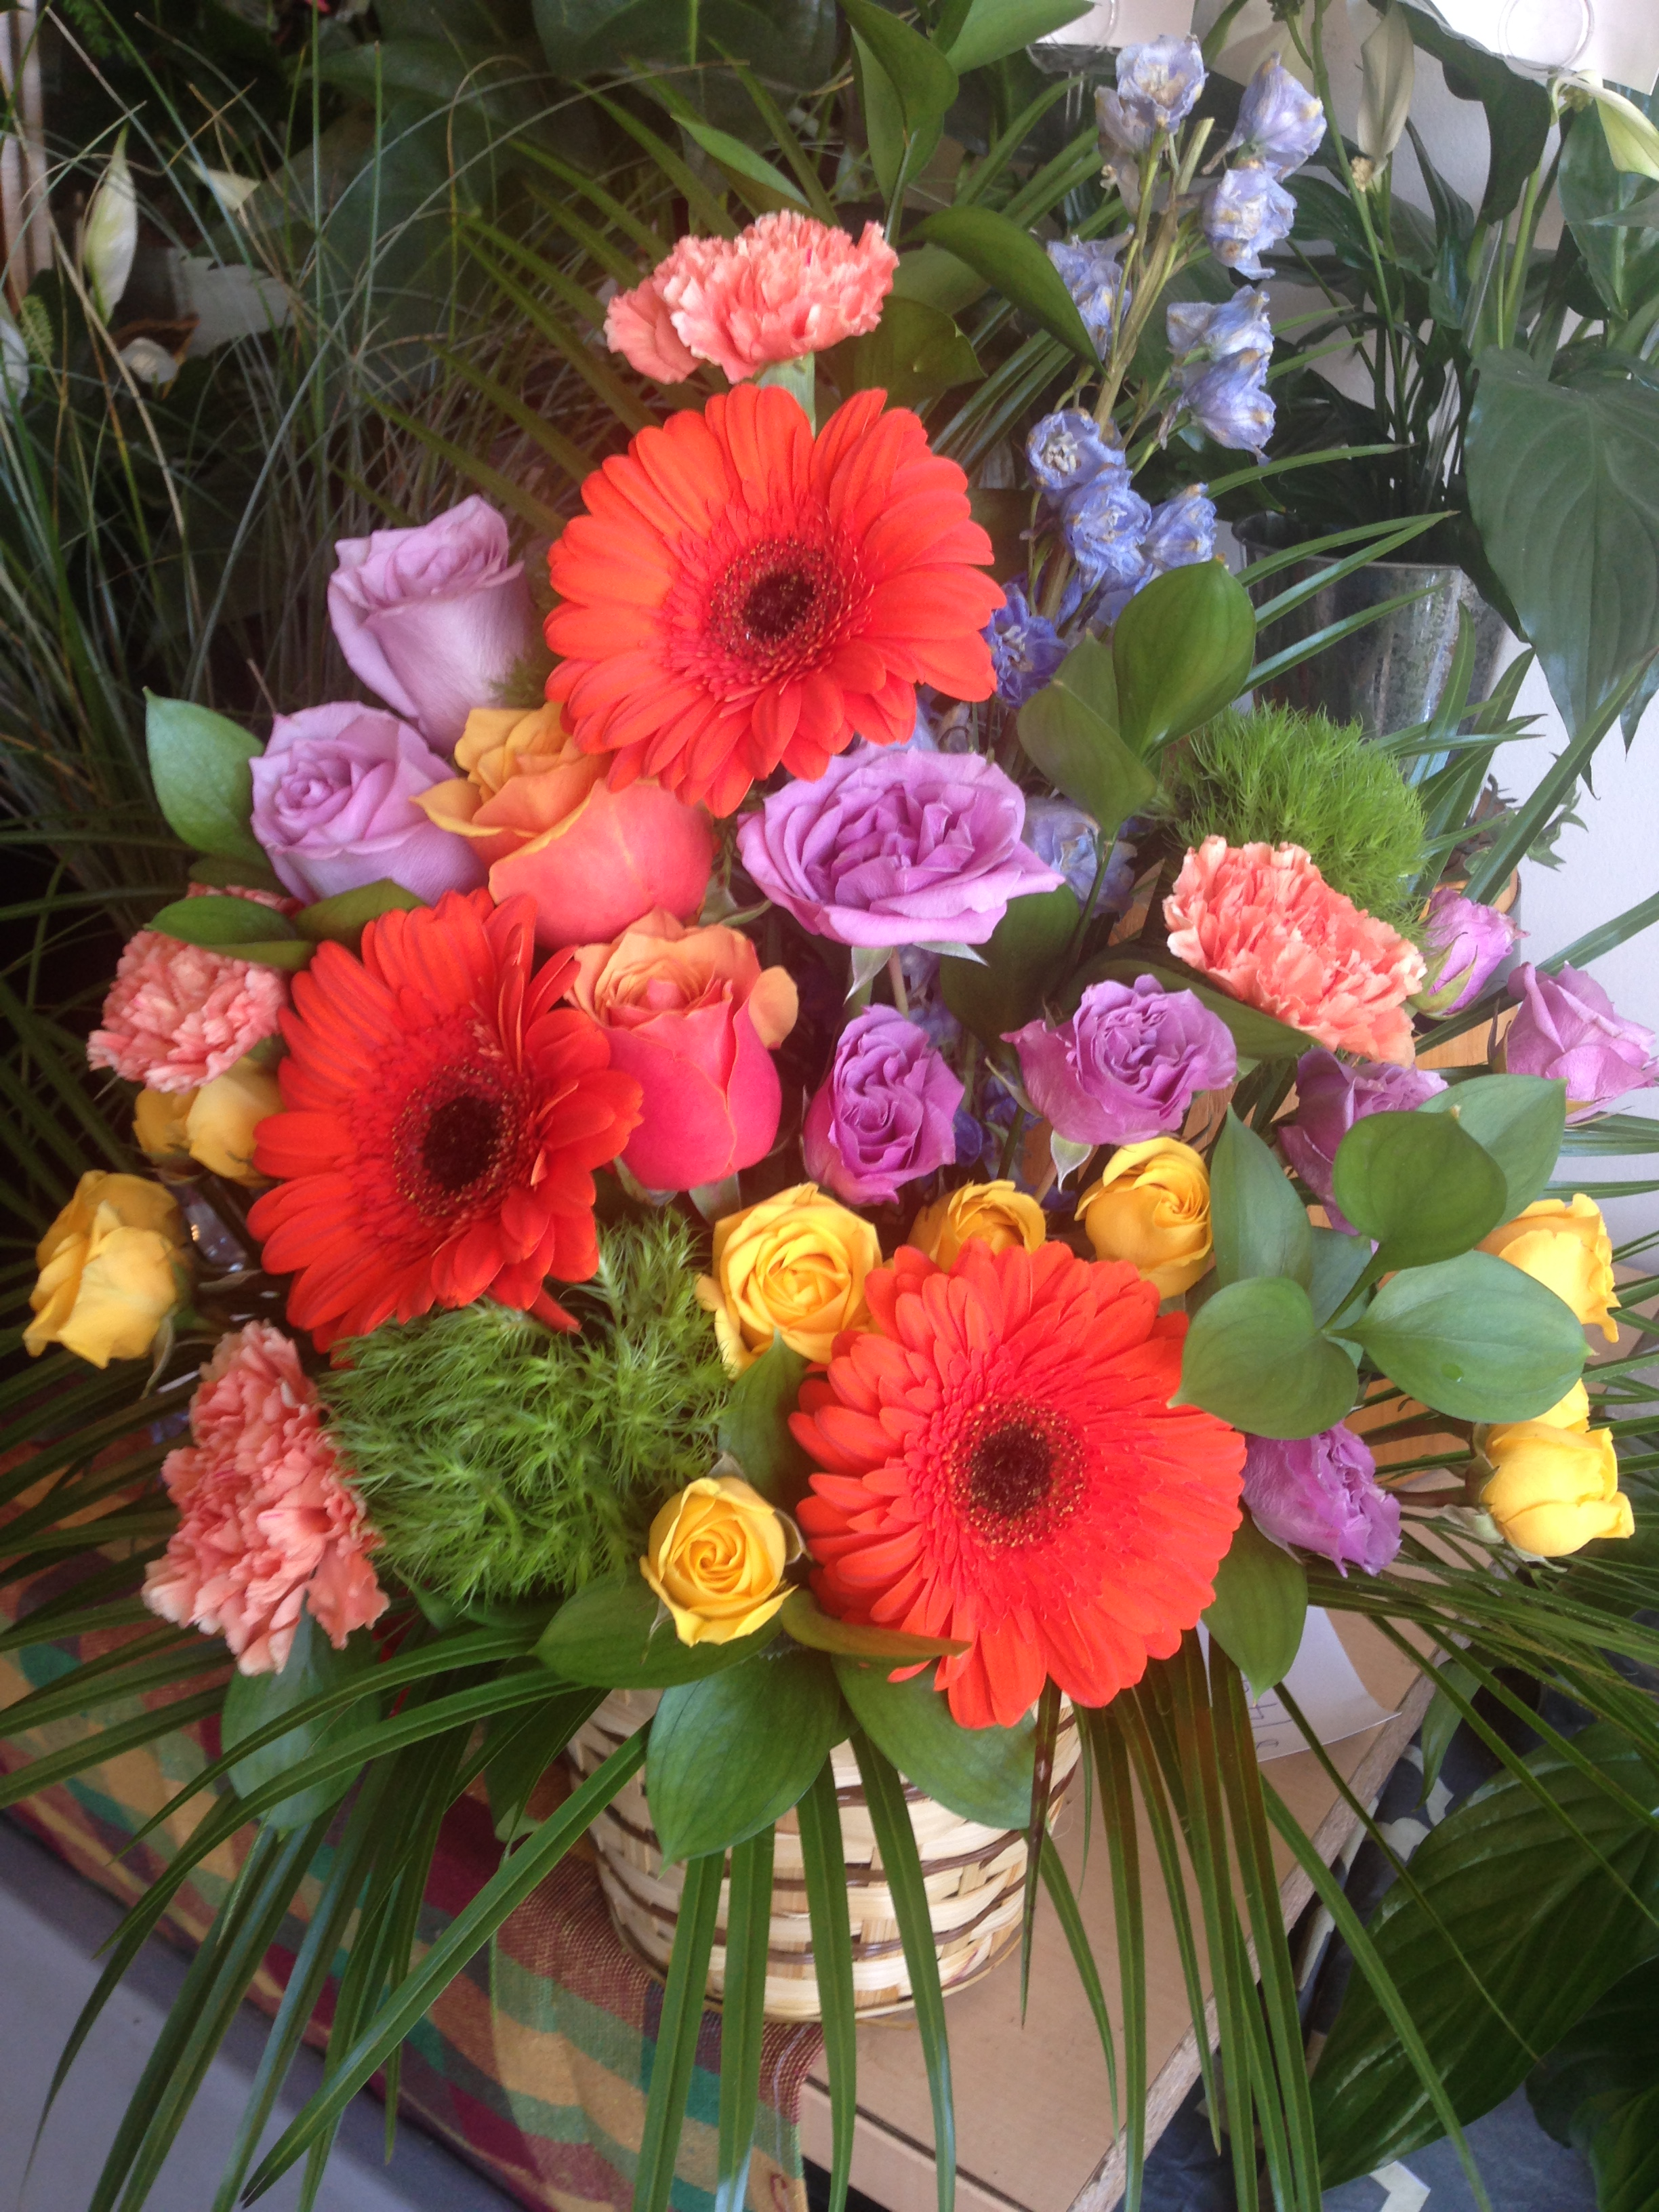 flowers_and_peggys_pics_001_emdrfo.jpg